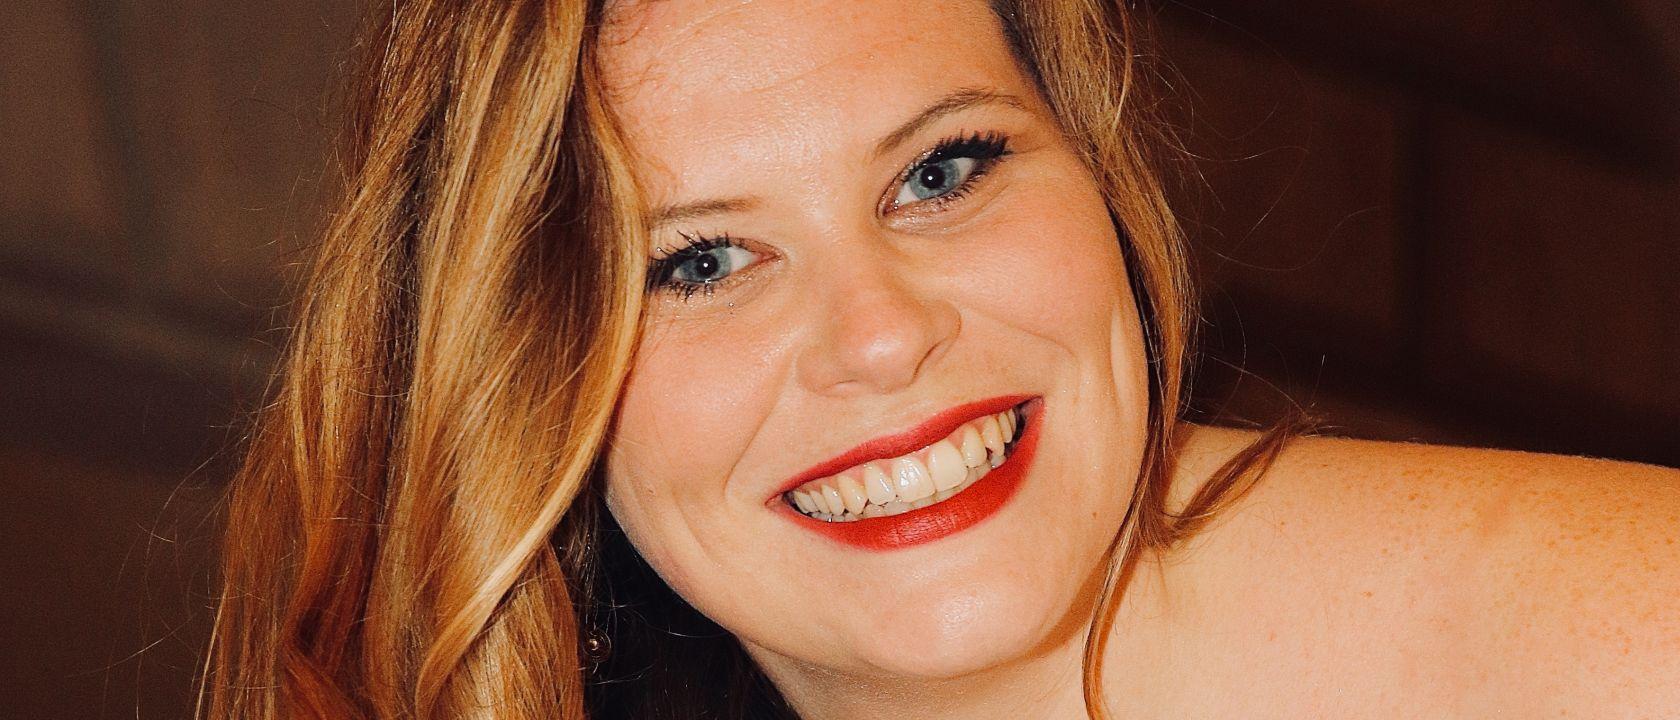 Marie-Andrée Bouchard-Lesieur Sängerin Mezzosopran Teilnehmerin Young Singers Project